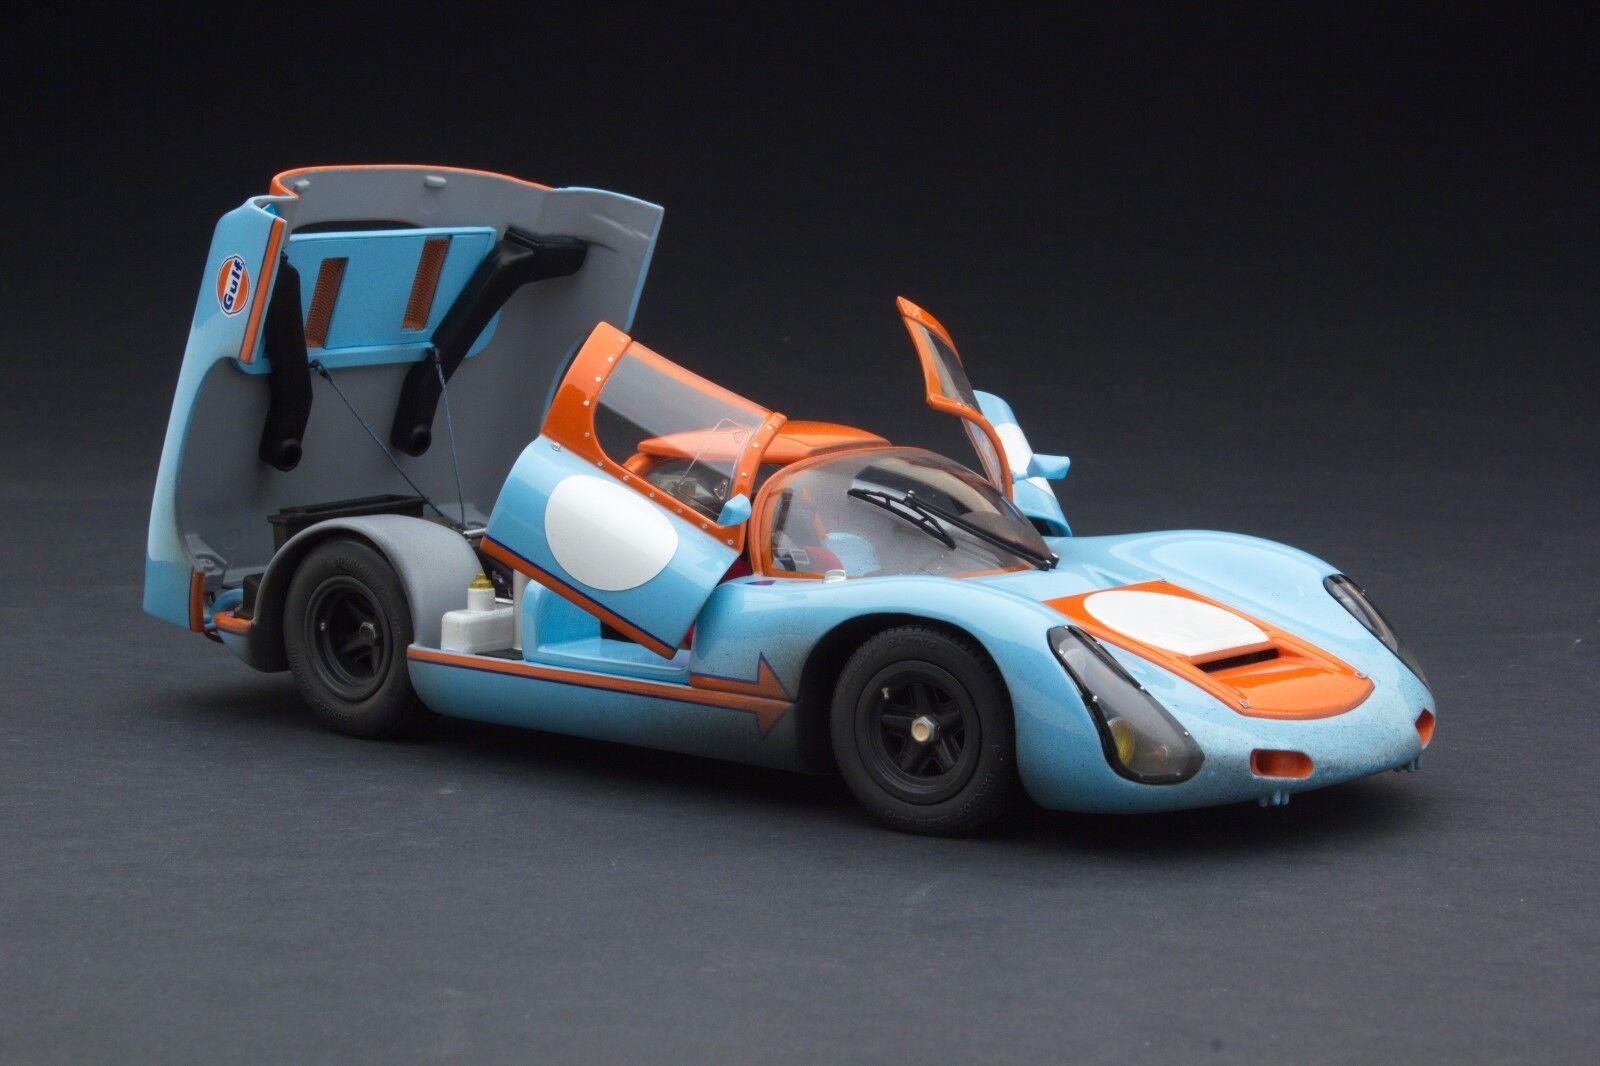 Carrera resistidoExoto Gulf Porsche 910Vintage Racing1:18MTB 00064 AFLP